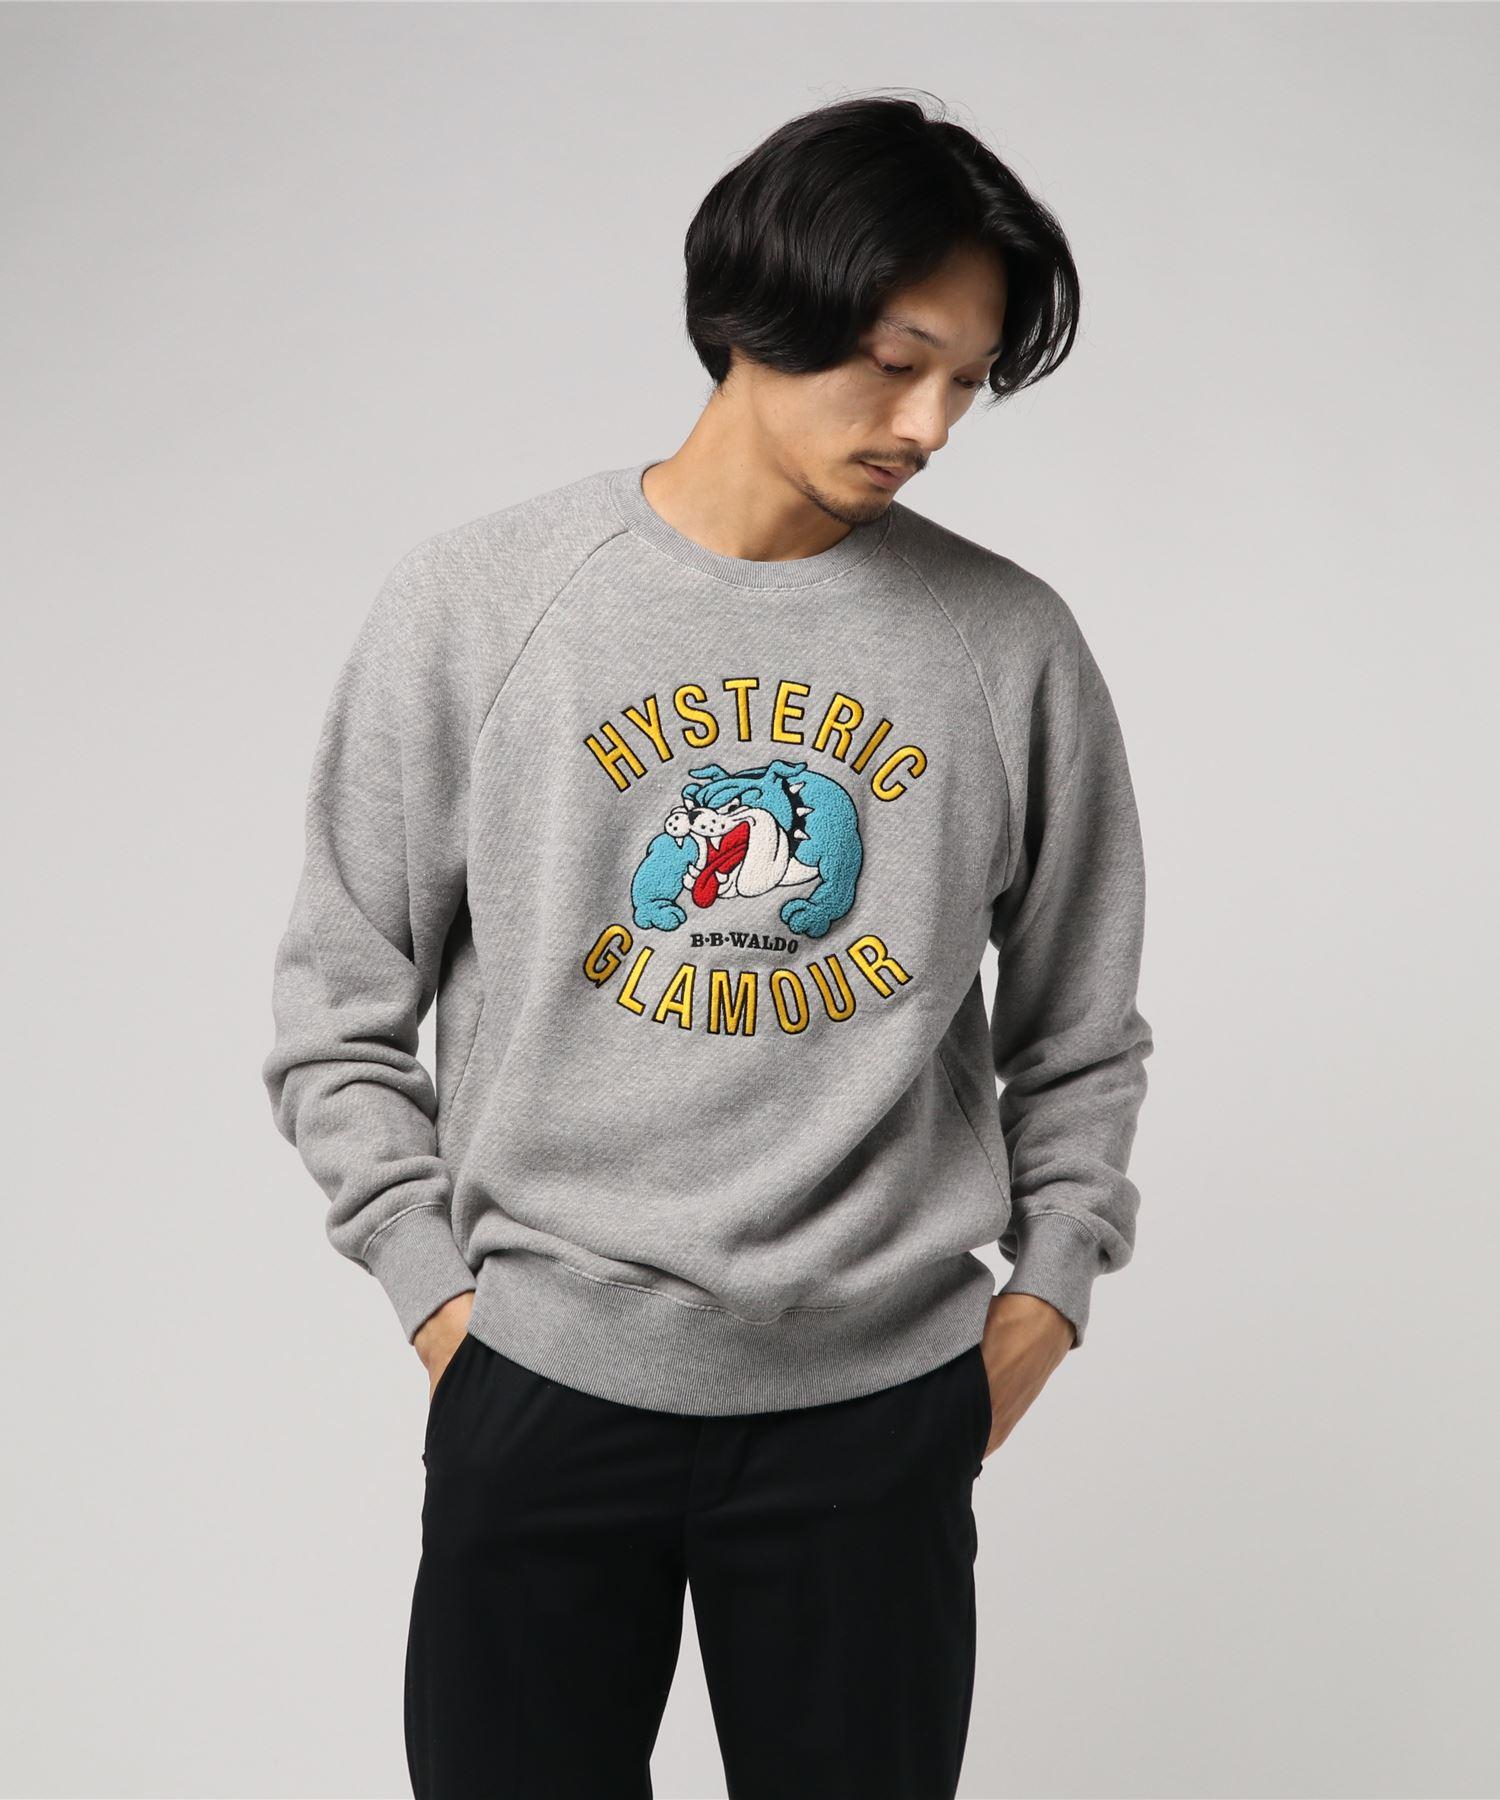 BB WALDO刺繍 スウェット